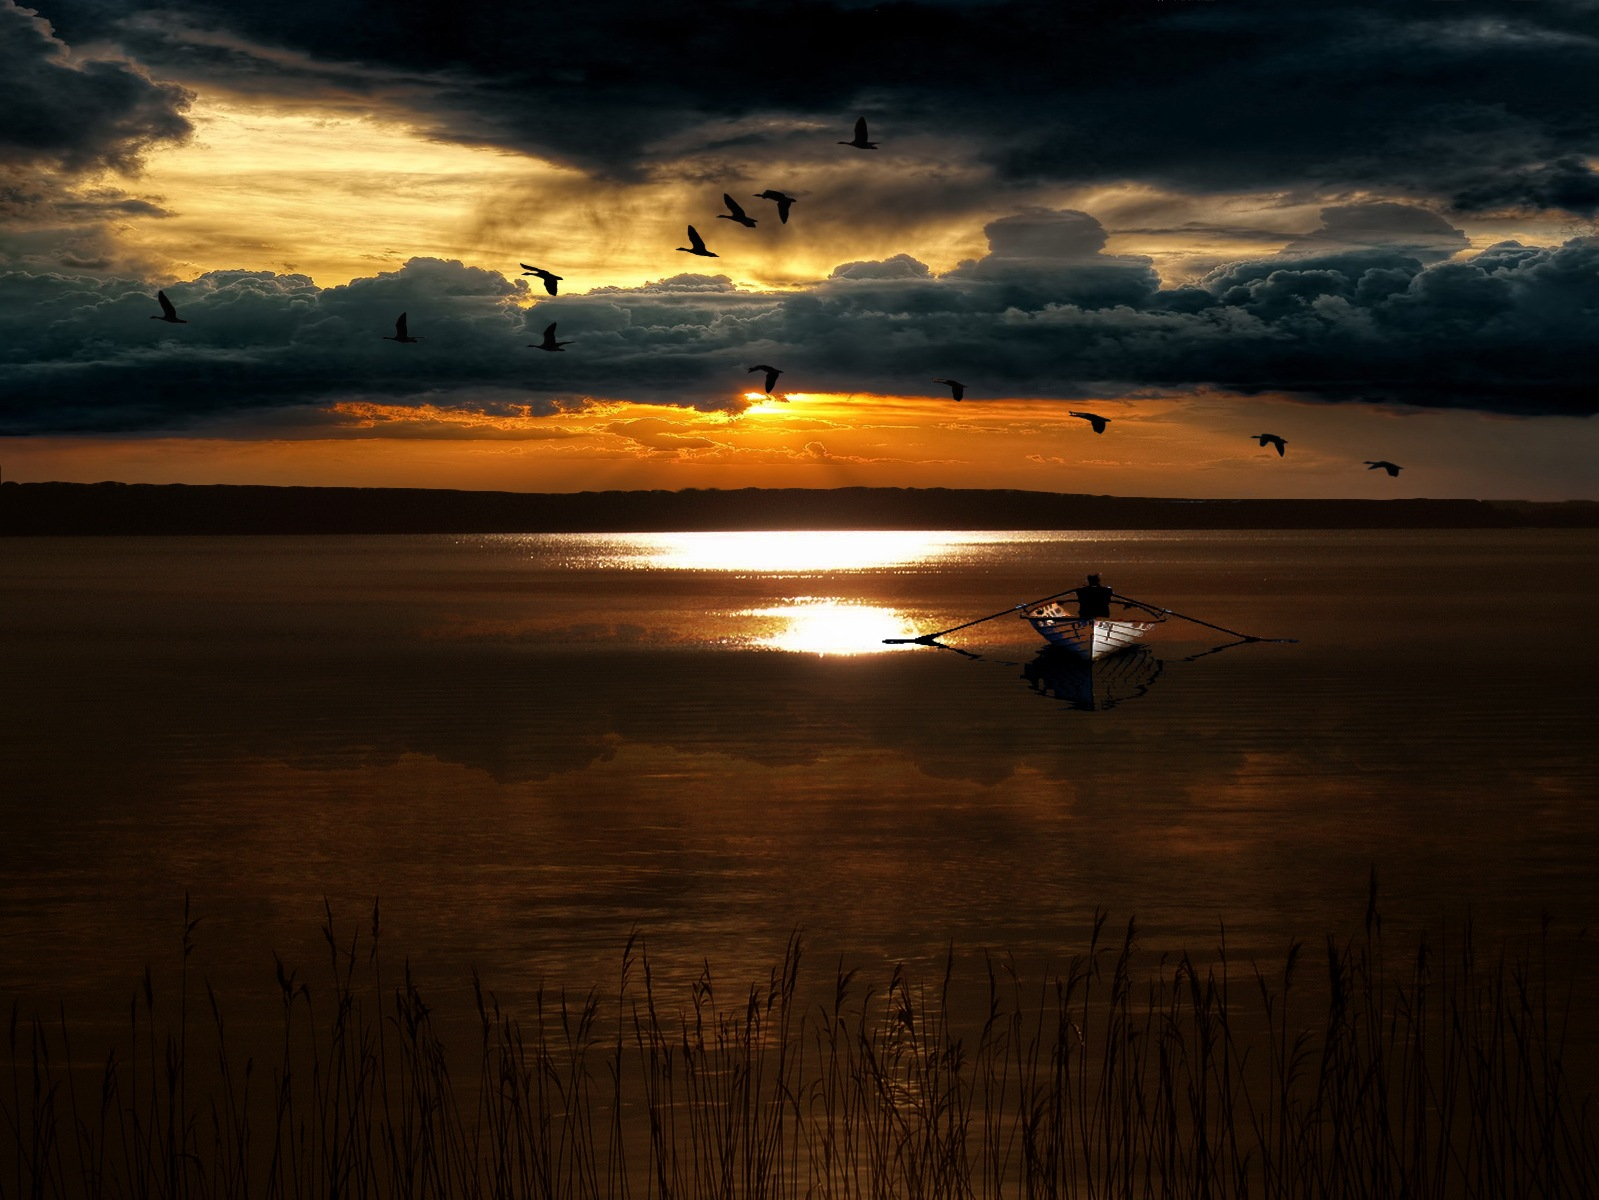 Afternoon fishing by Per Lindskog